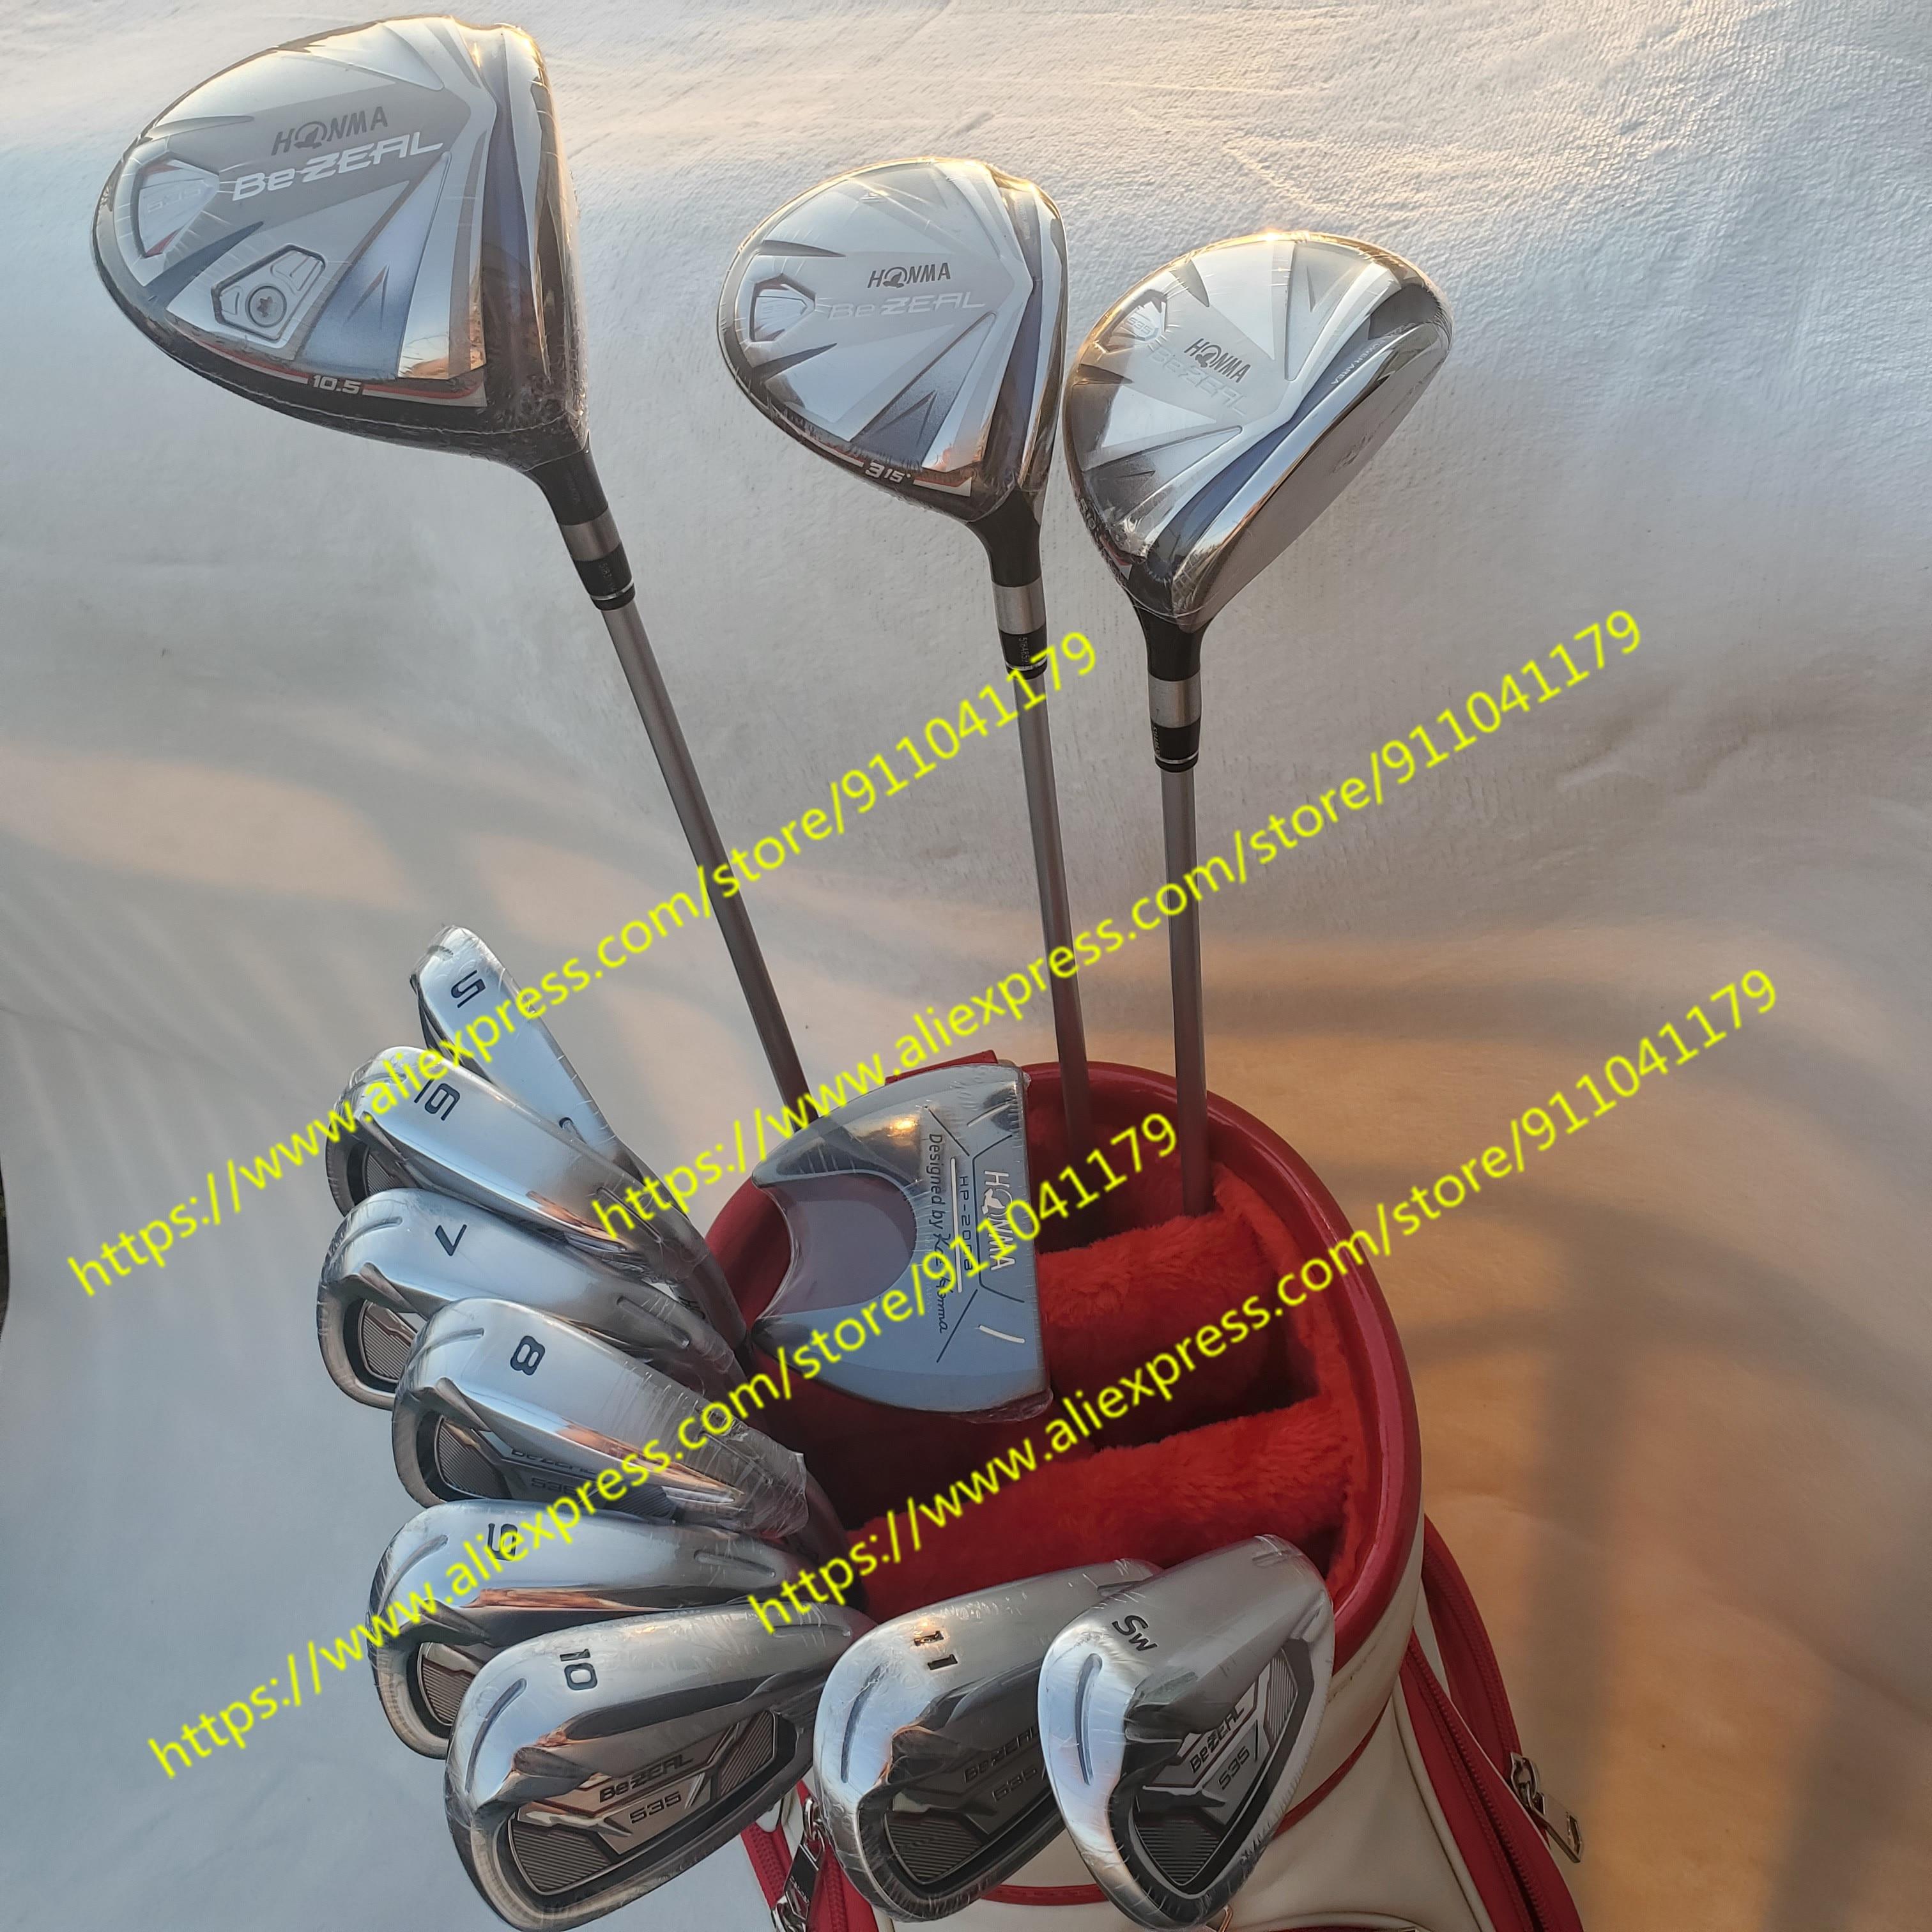 2021 Men's Golf clubs set HONMA Golf Club HONMA BEZEAL 535 Golf Complete Set with wood putter Head Cover (No Bag)